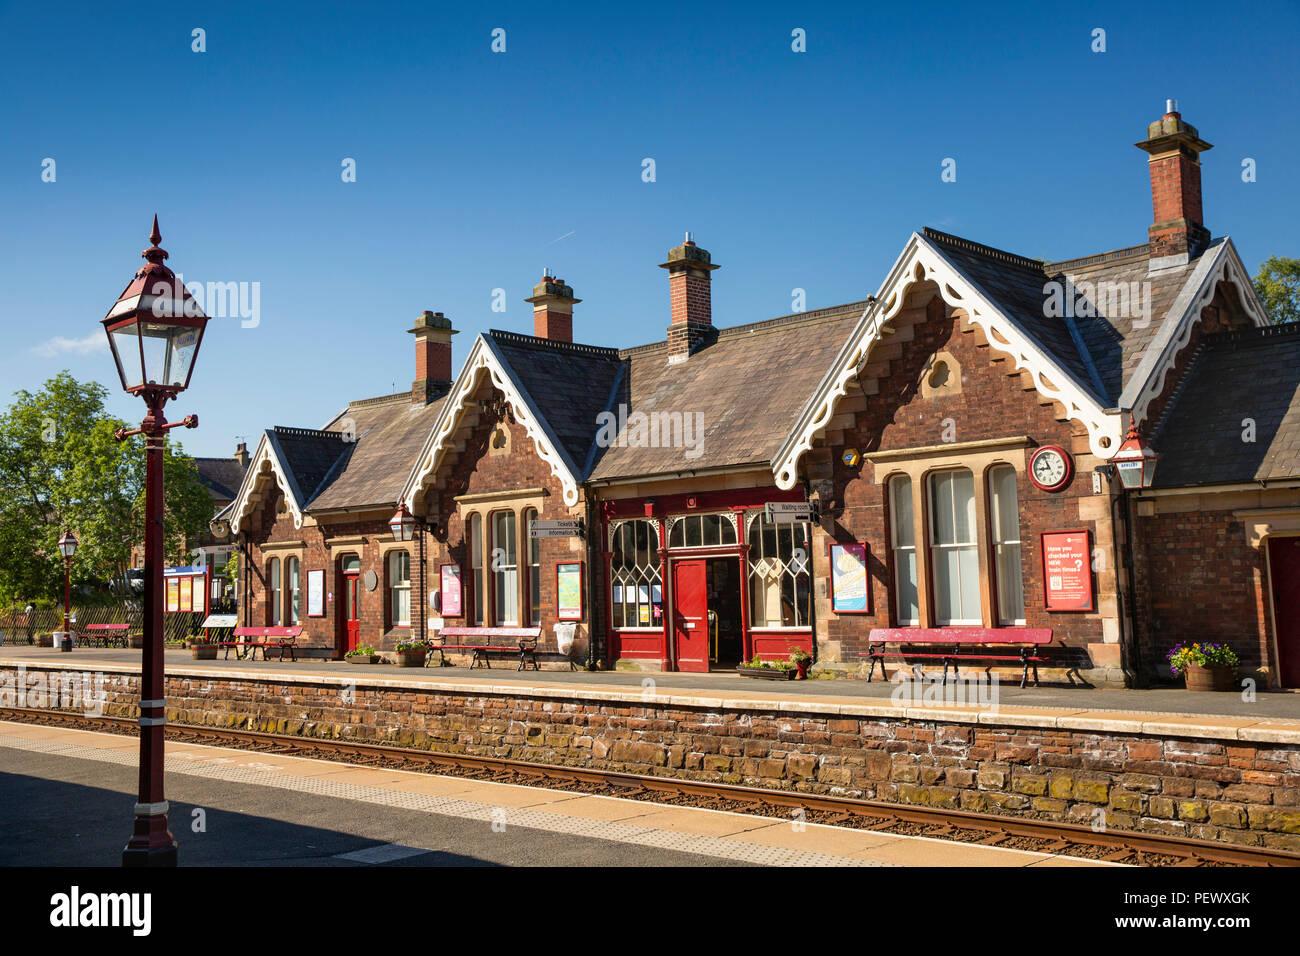 UK, Cumbria, Eden Valley, Appleby Station on Settle to Carlisle Line - Stock Image